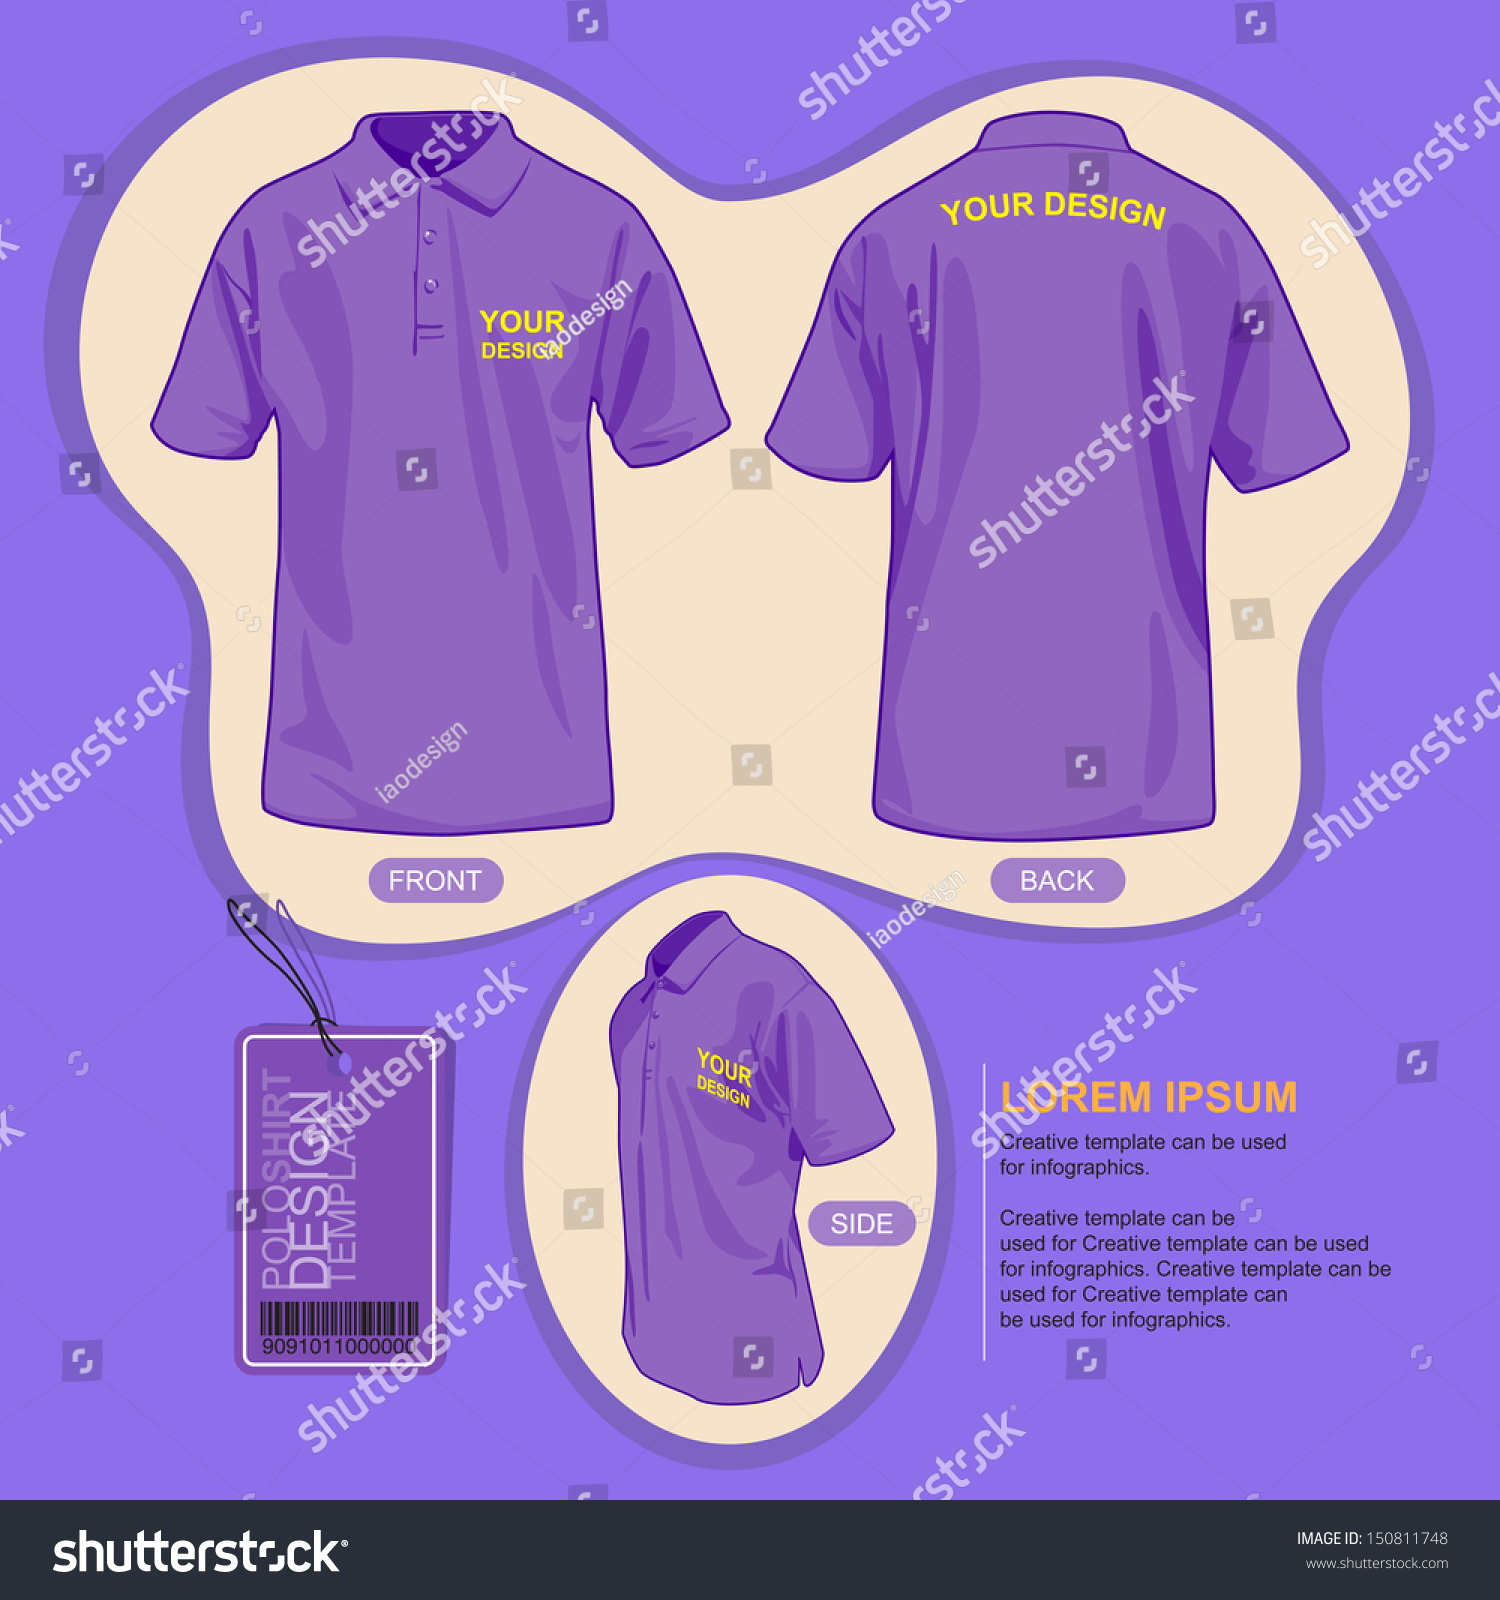 Shirt uniform design vector - Polo Shirt Uniform Template Illustration By Vector Design Preview Save To A Lightbox